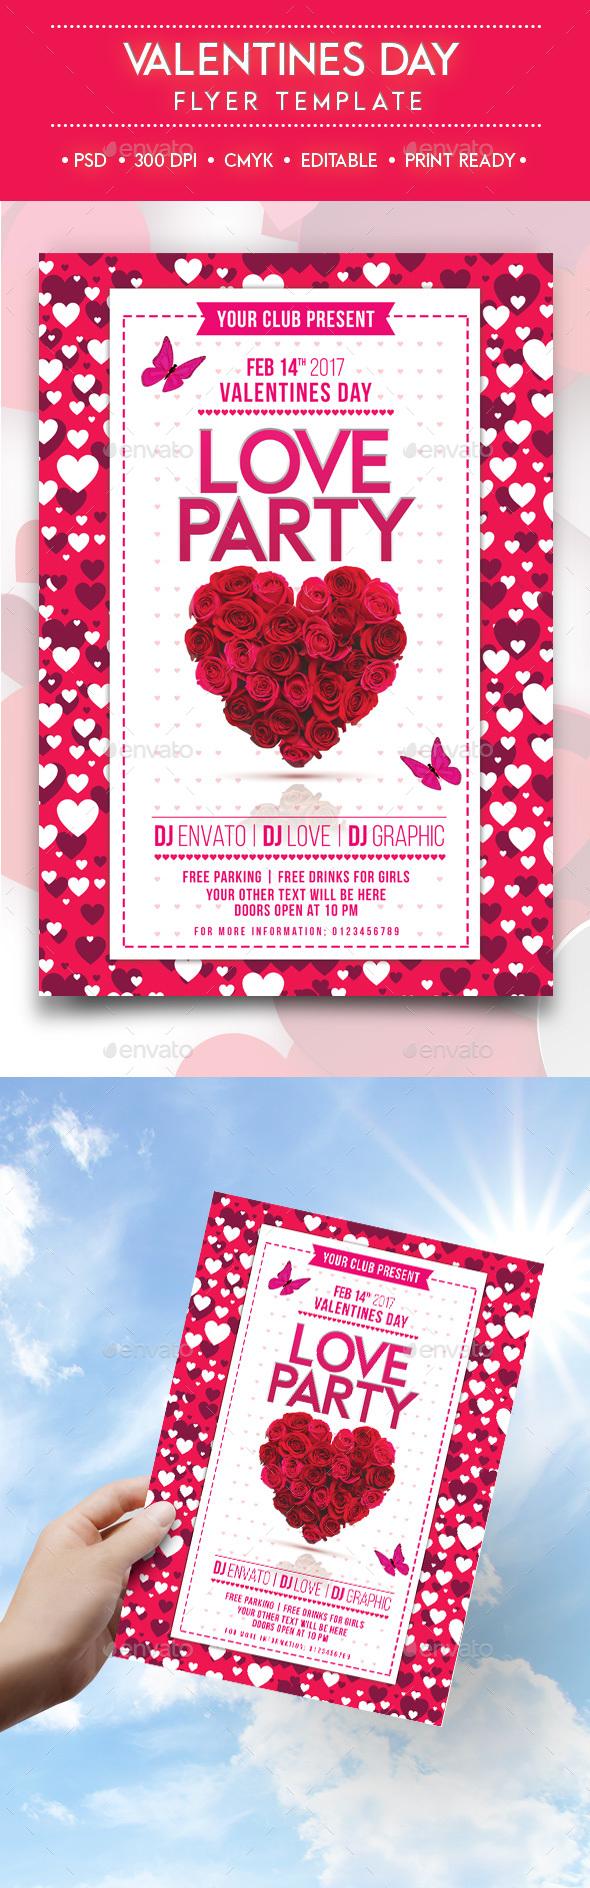 Valentines Flyer